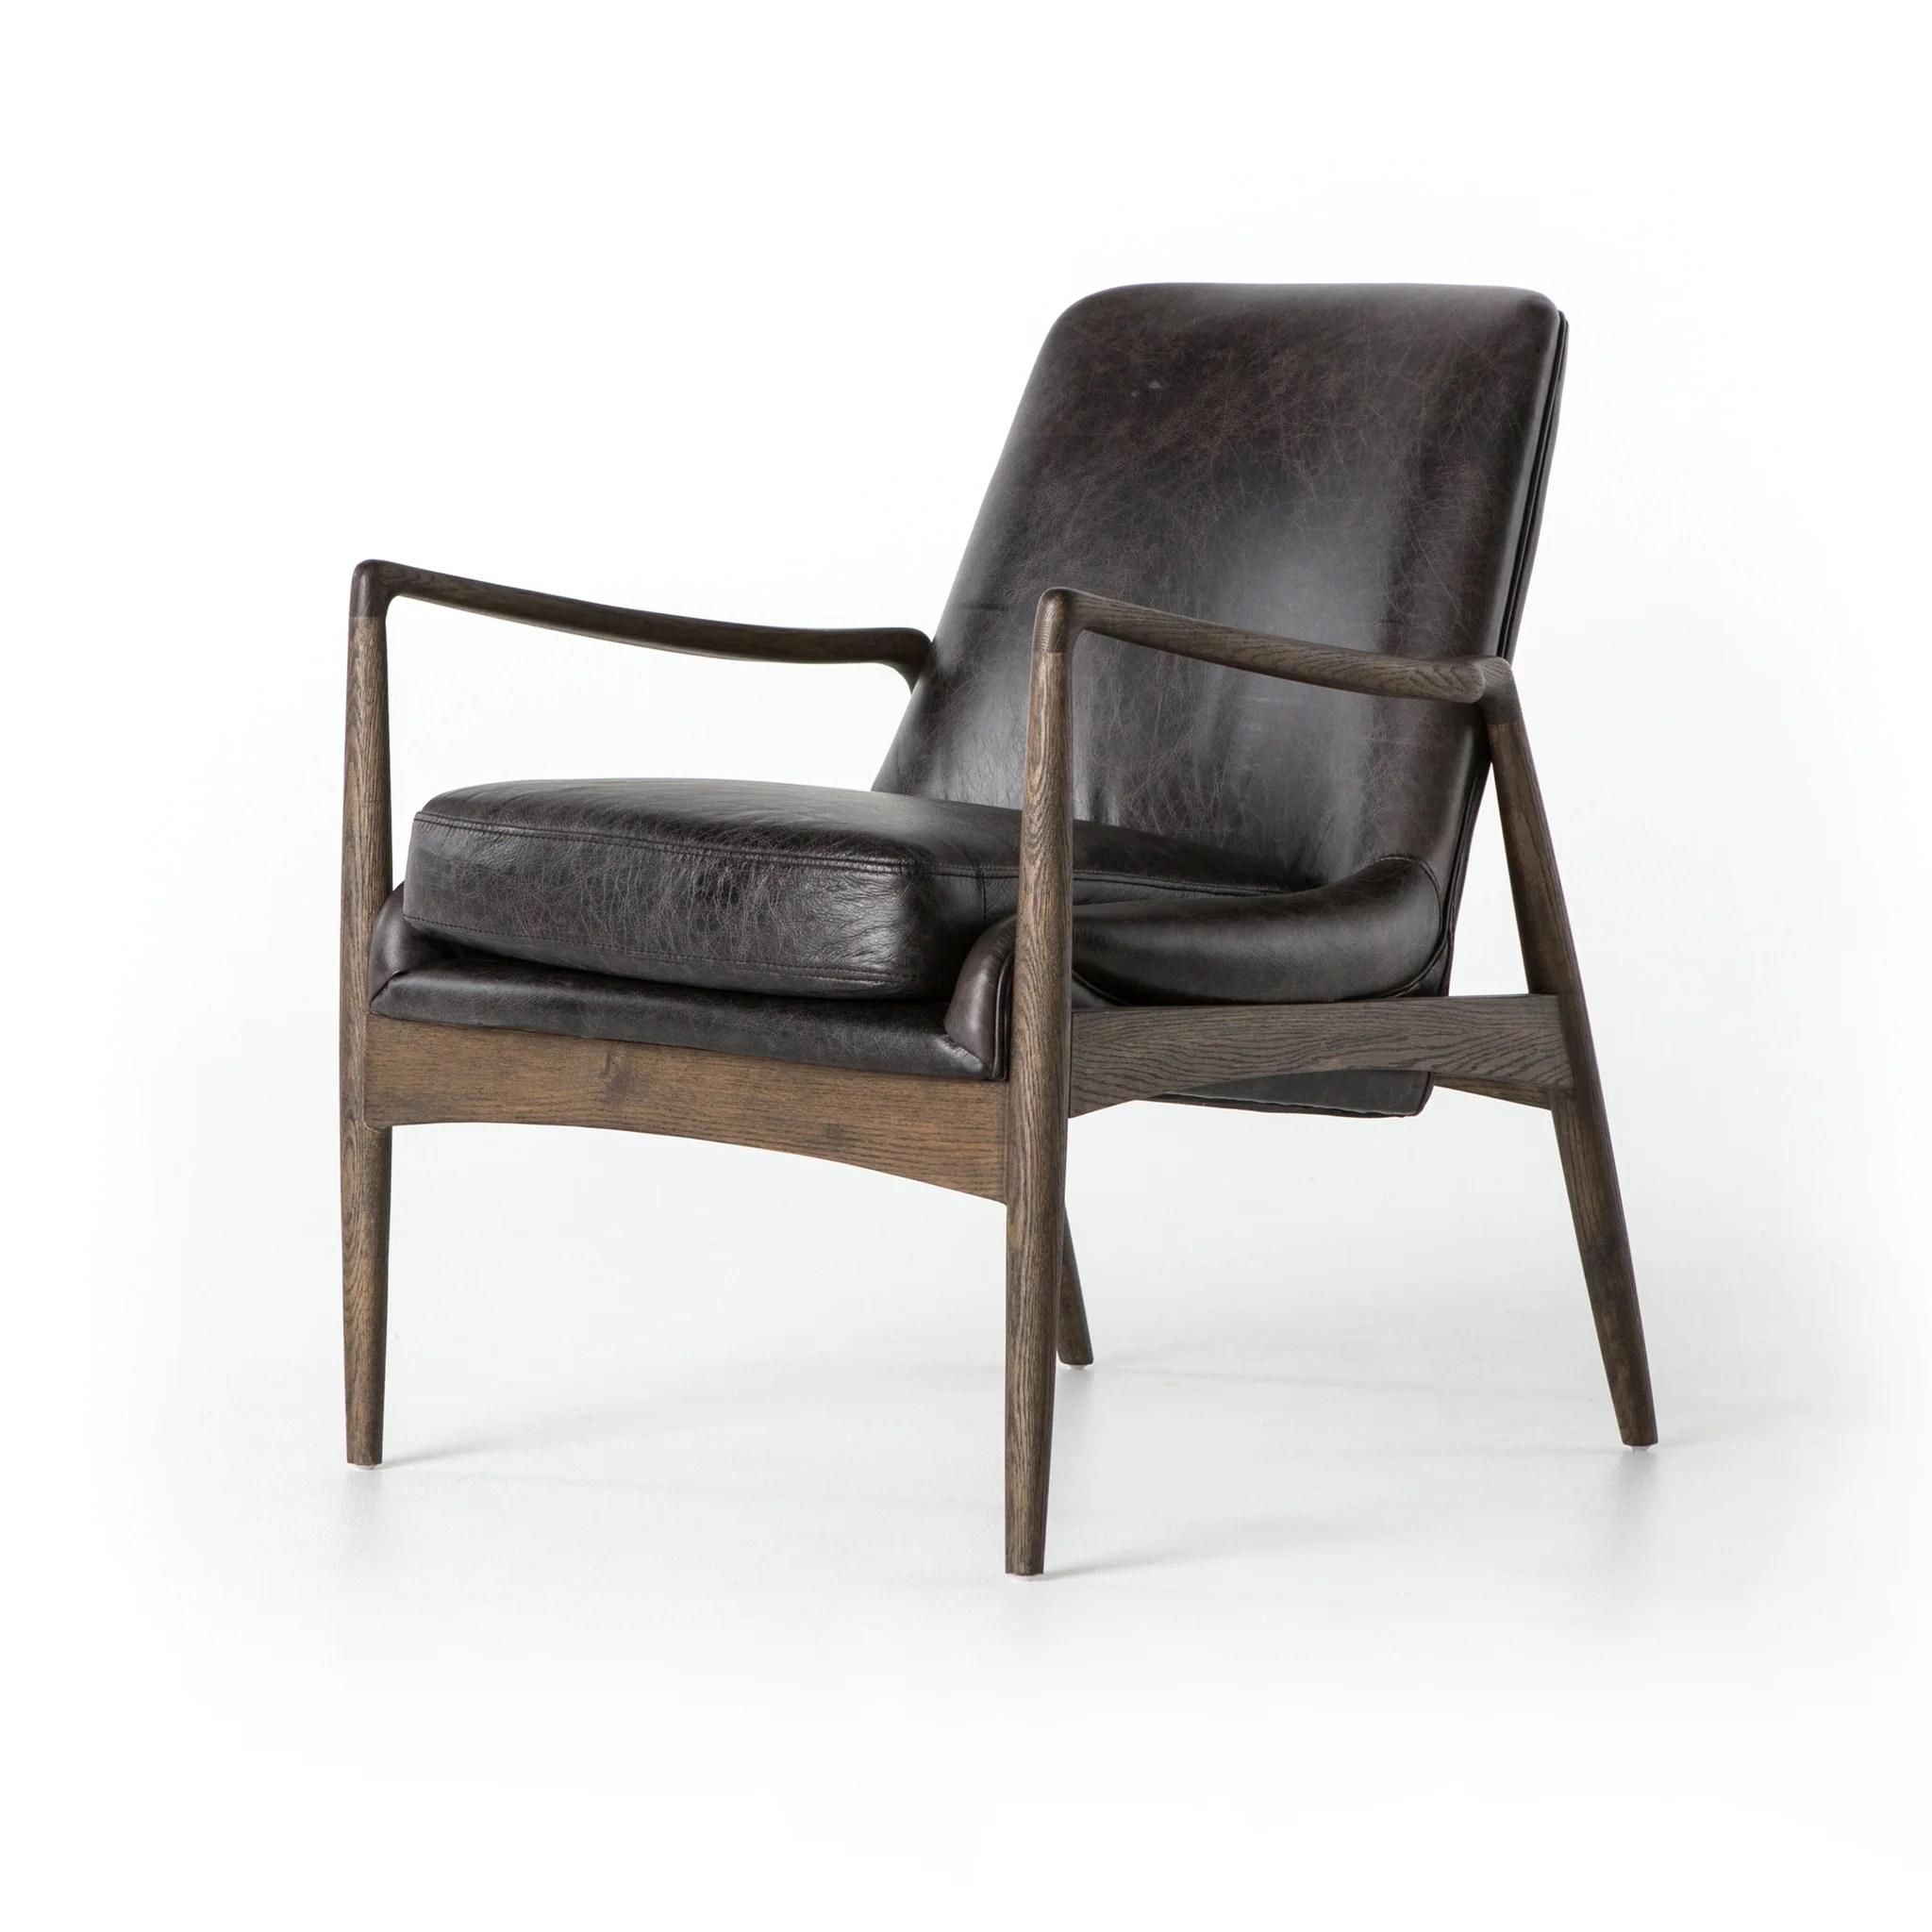 chair design bd high stand aidan leather in durango smoke by studio burke decor